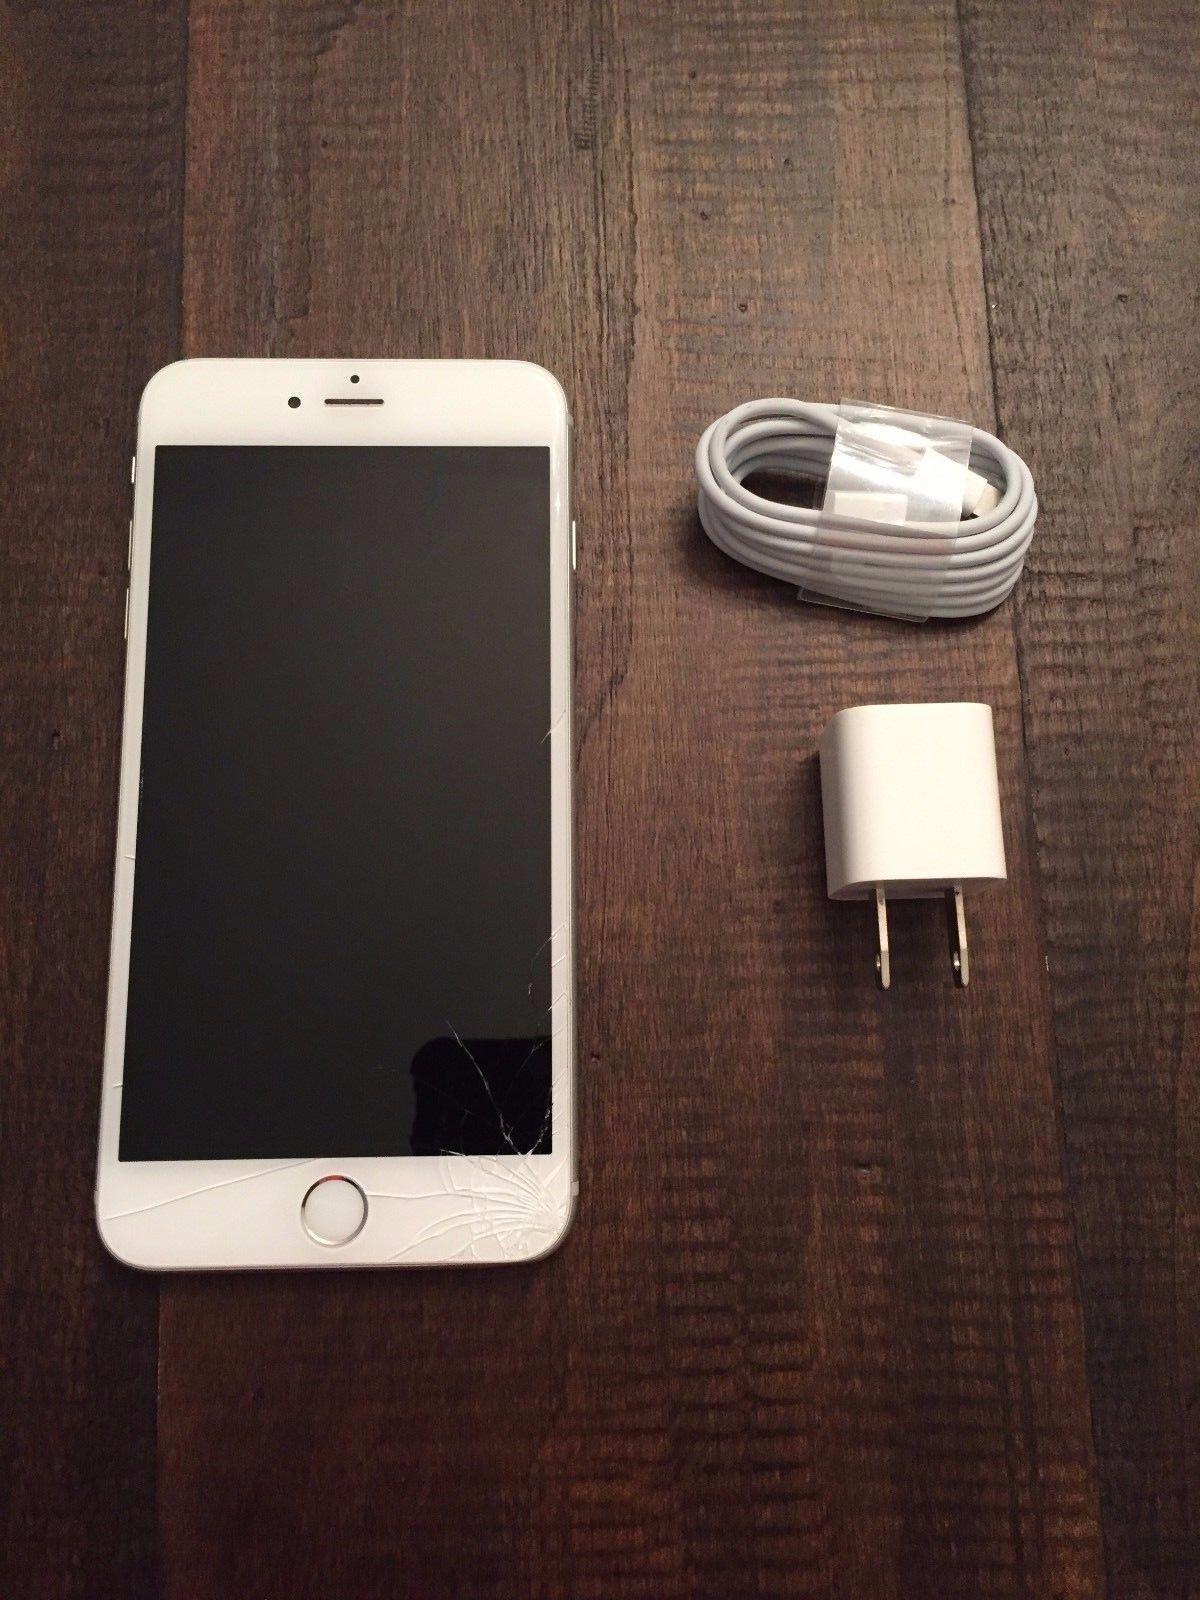 Apple iPhone 6 Plus - 64GB - Silver Verizon Smartphone - Cracked Screen Working https://t.co/LpZHHX7zGs https://t.co/4DUVSo17j5